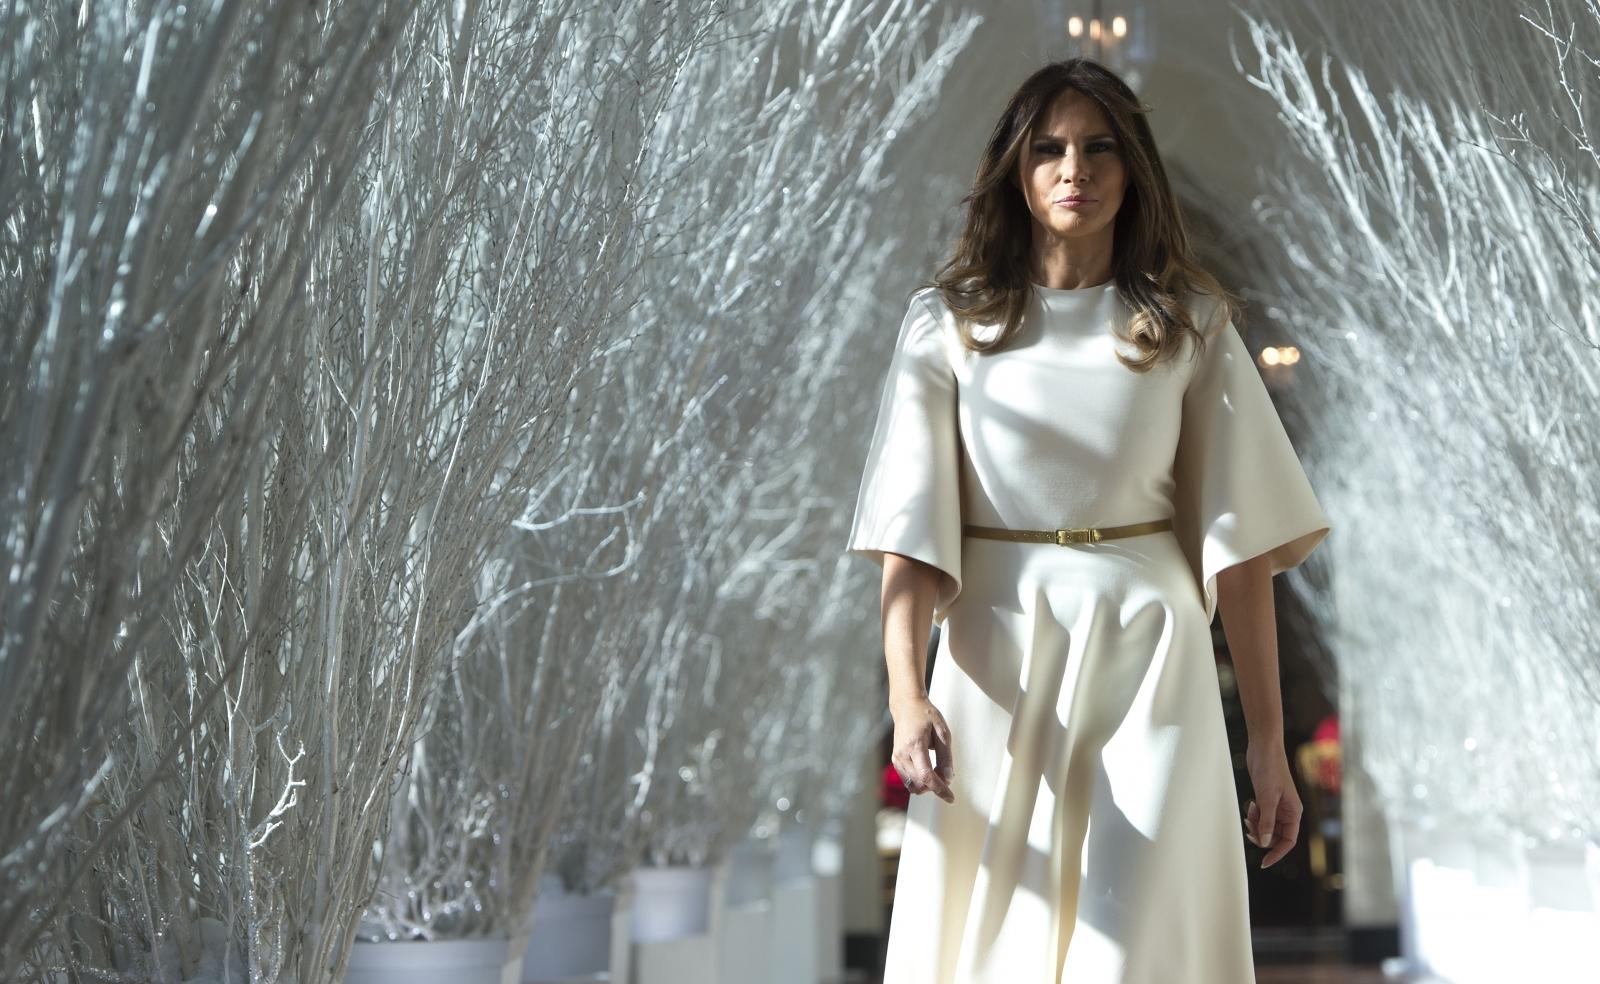 Melania Trump at the White House